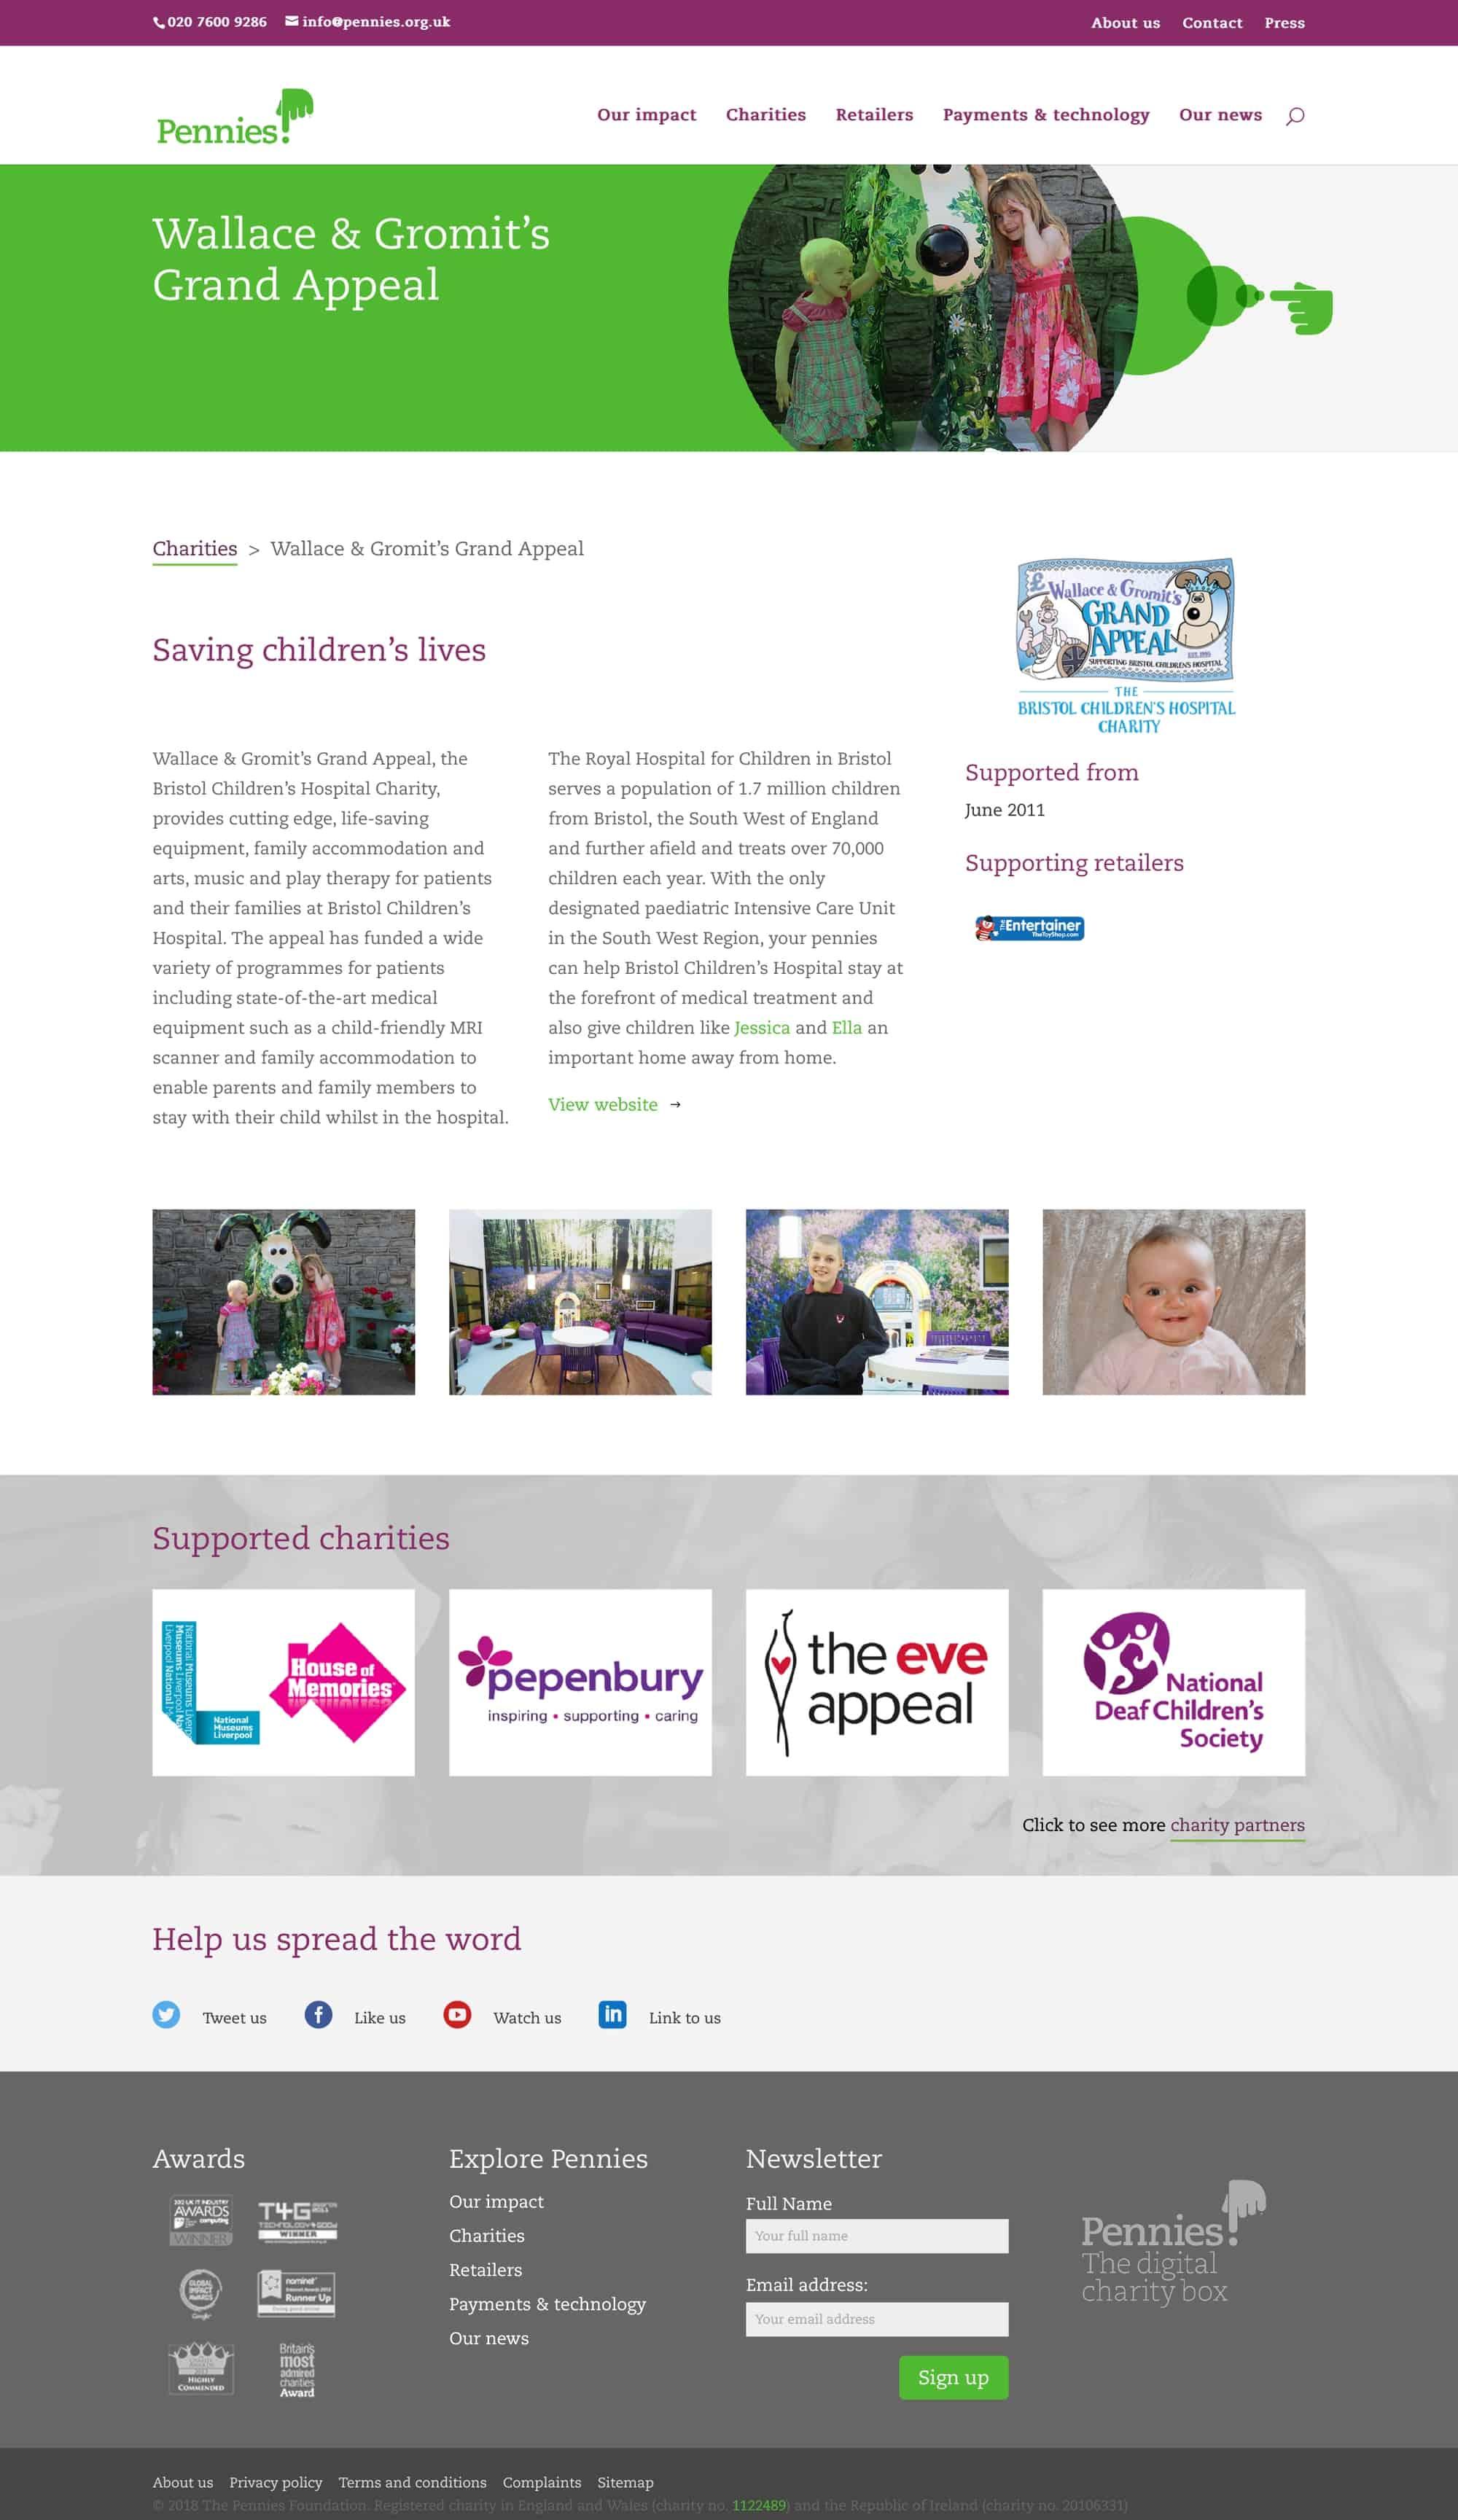 Pennies charity page screenshot